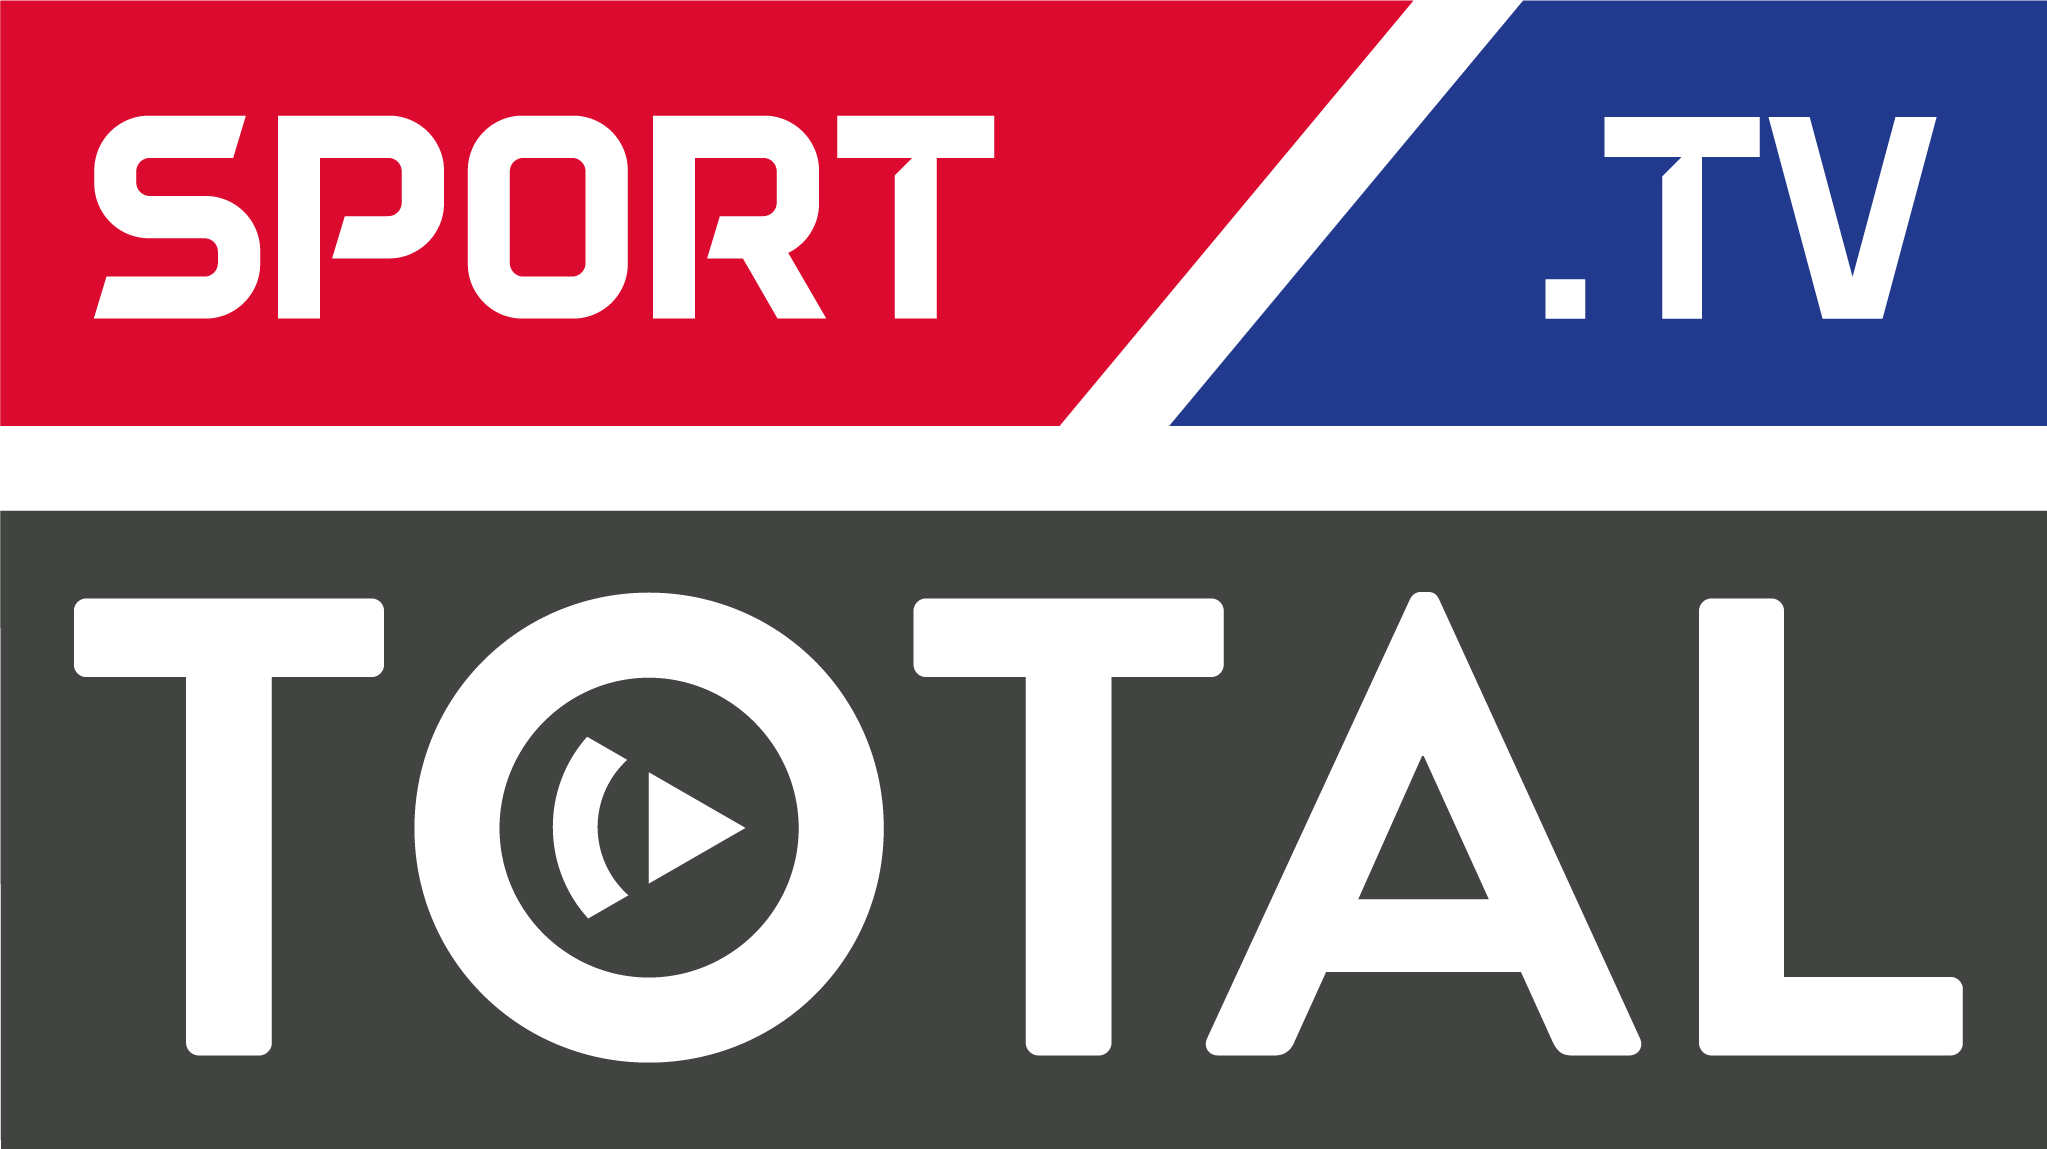 Sponsor Sport Total